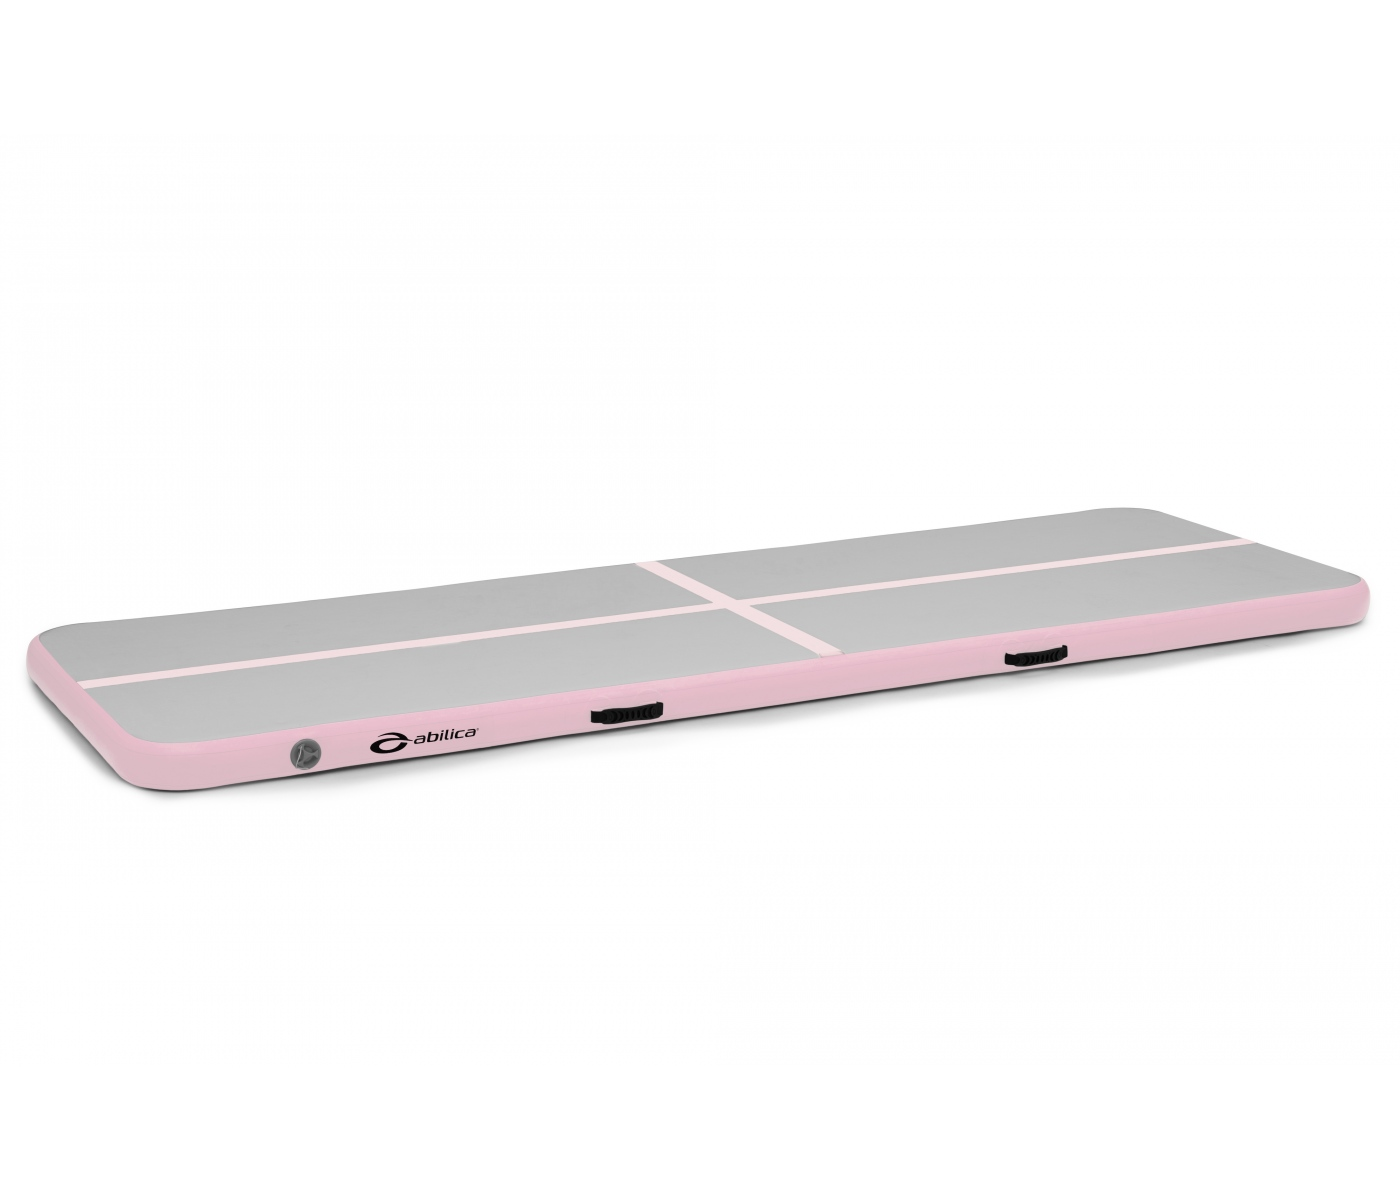 Abilica AirTrack 5m x 1m x 10cm rosa